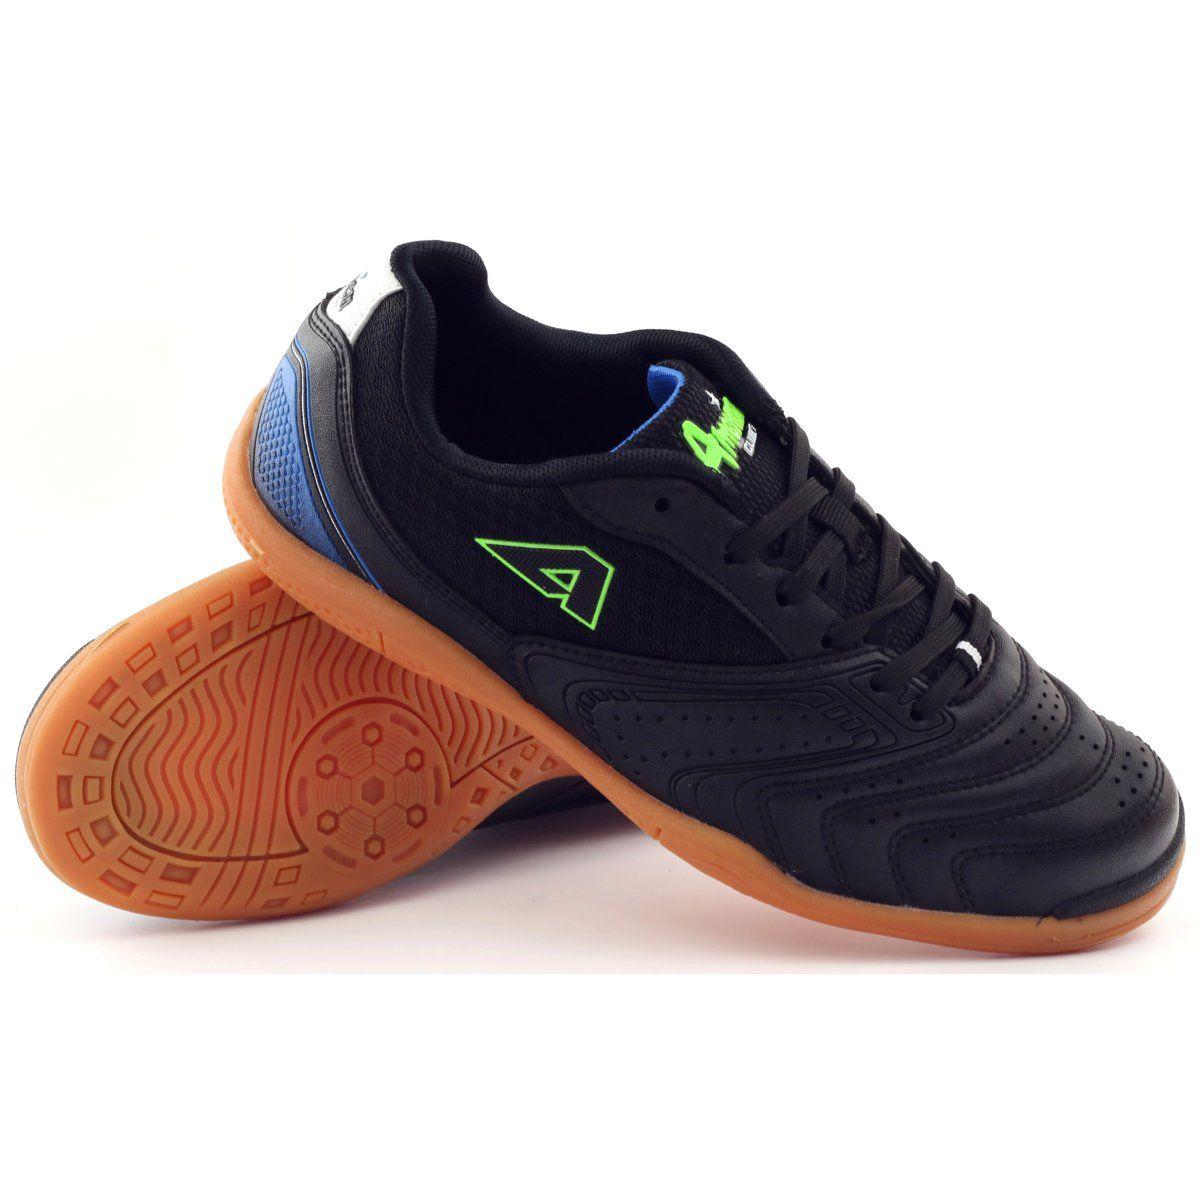 American Club Adi Buty Meskie Sportowe Halowki American 160709 Czarne Niebieskie Zielone Shoes New Balance Sneaker Sneakers